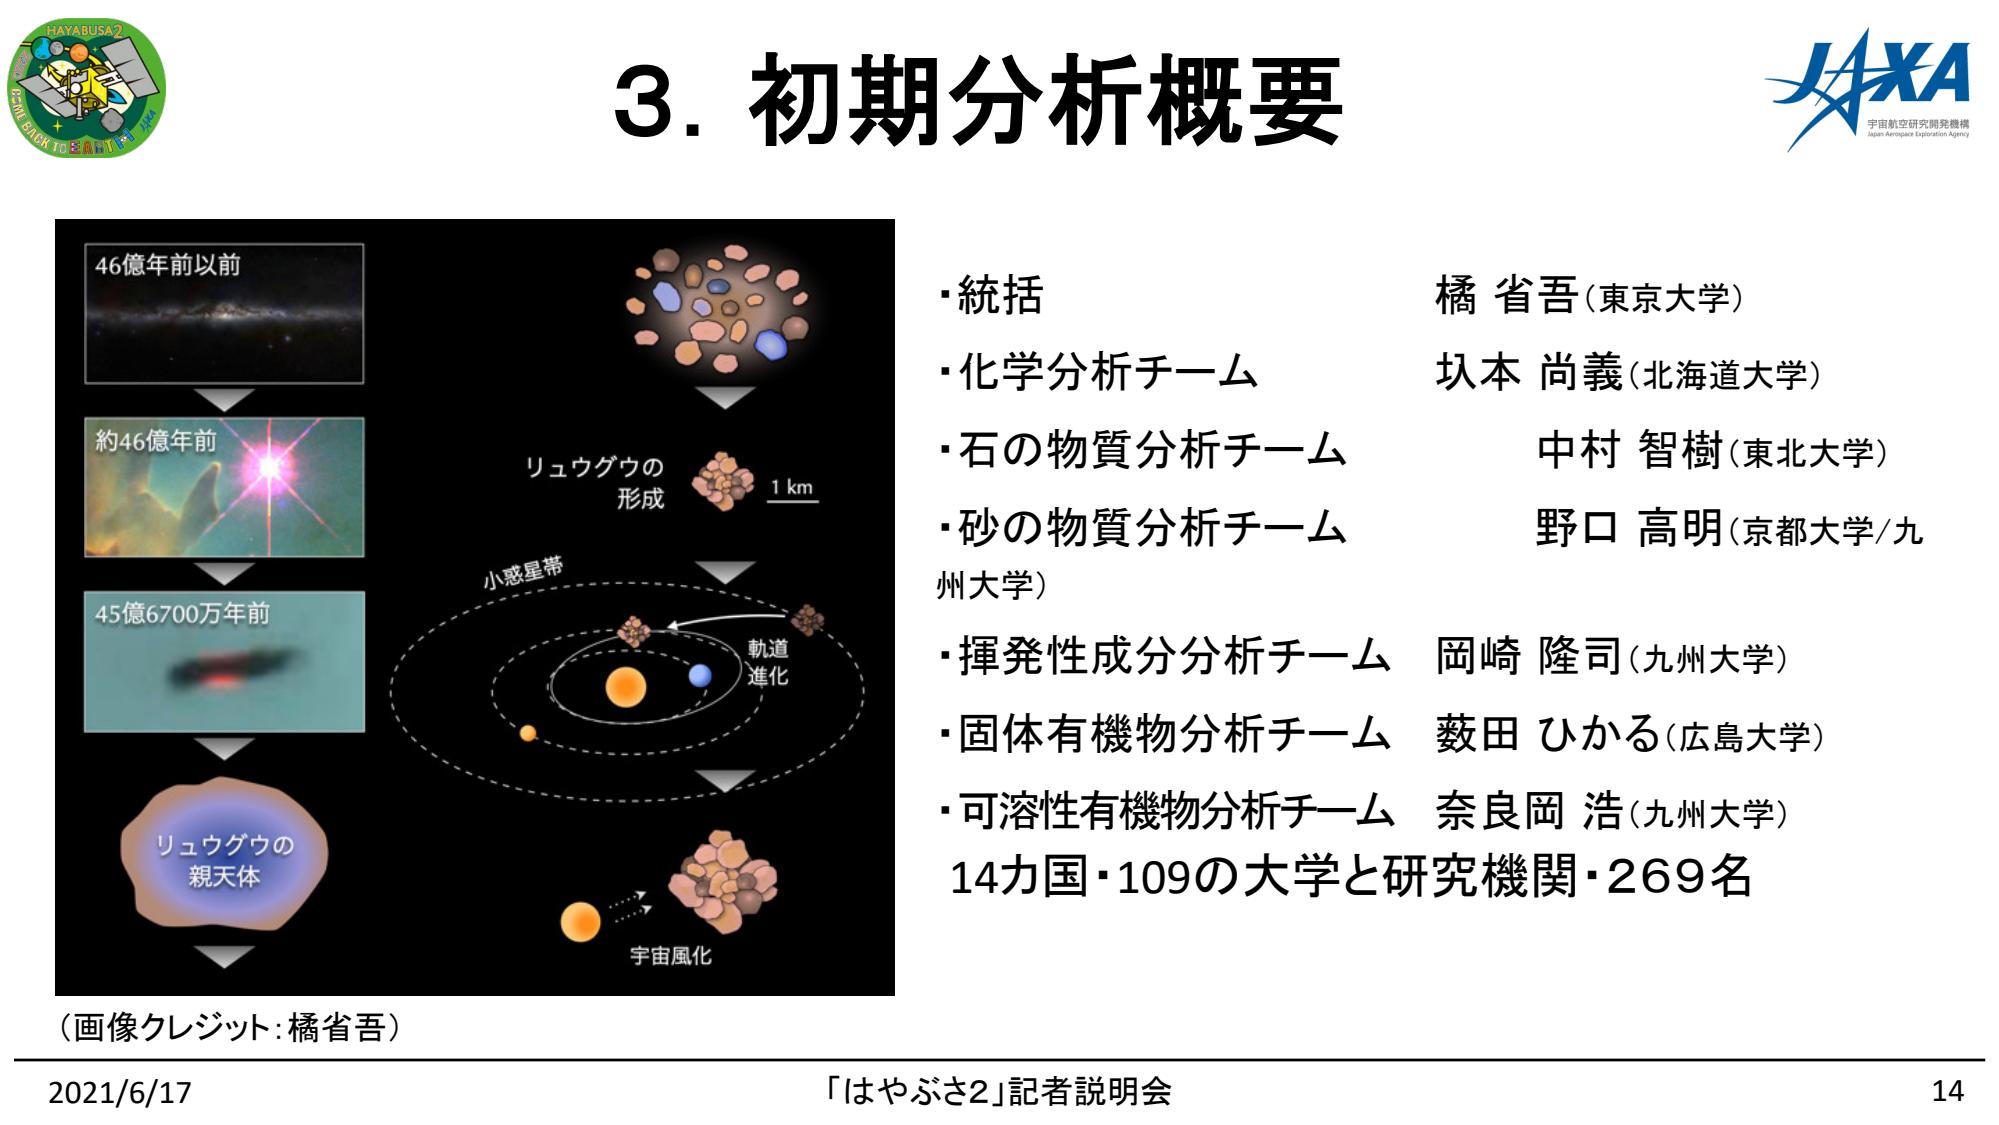 f:id:Imamura:20210617130242p:plain